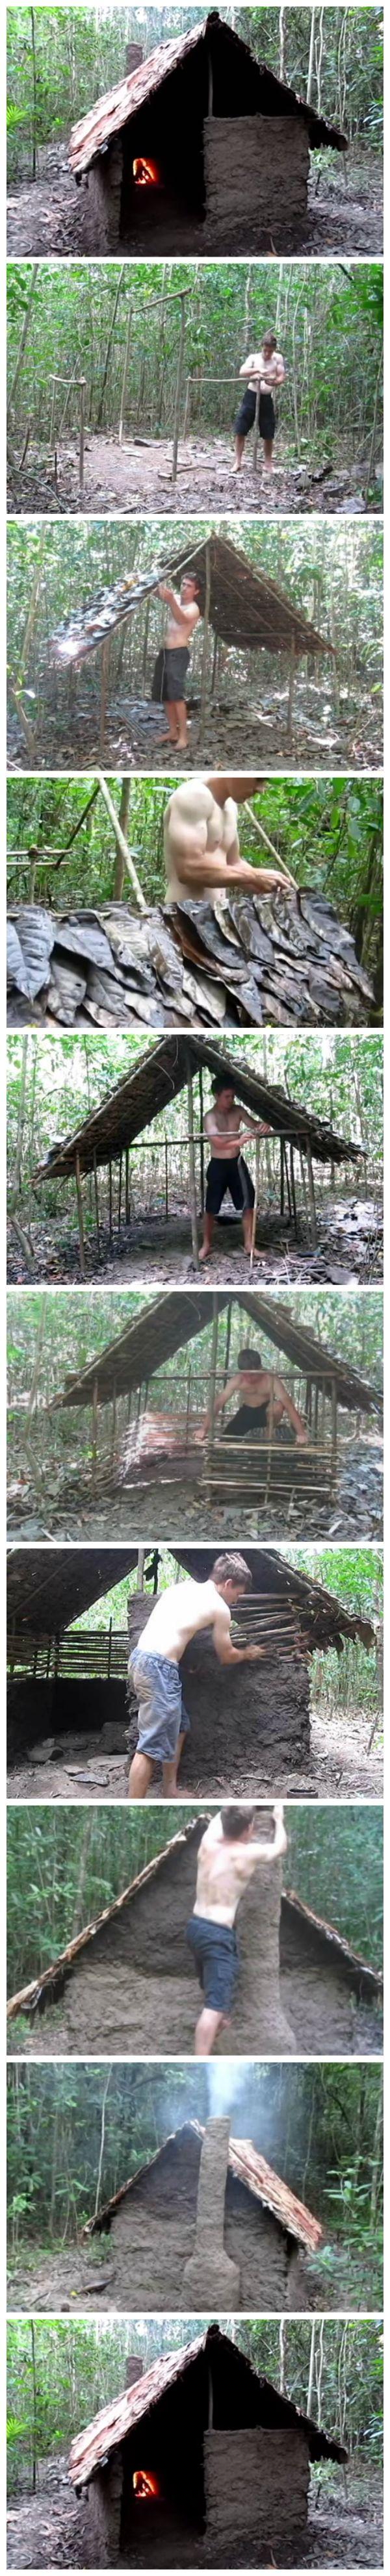 Building a Primitive Wattle and Daub Hut From Scratch